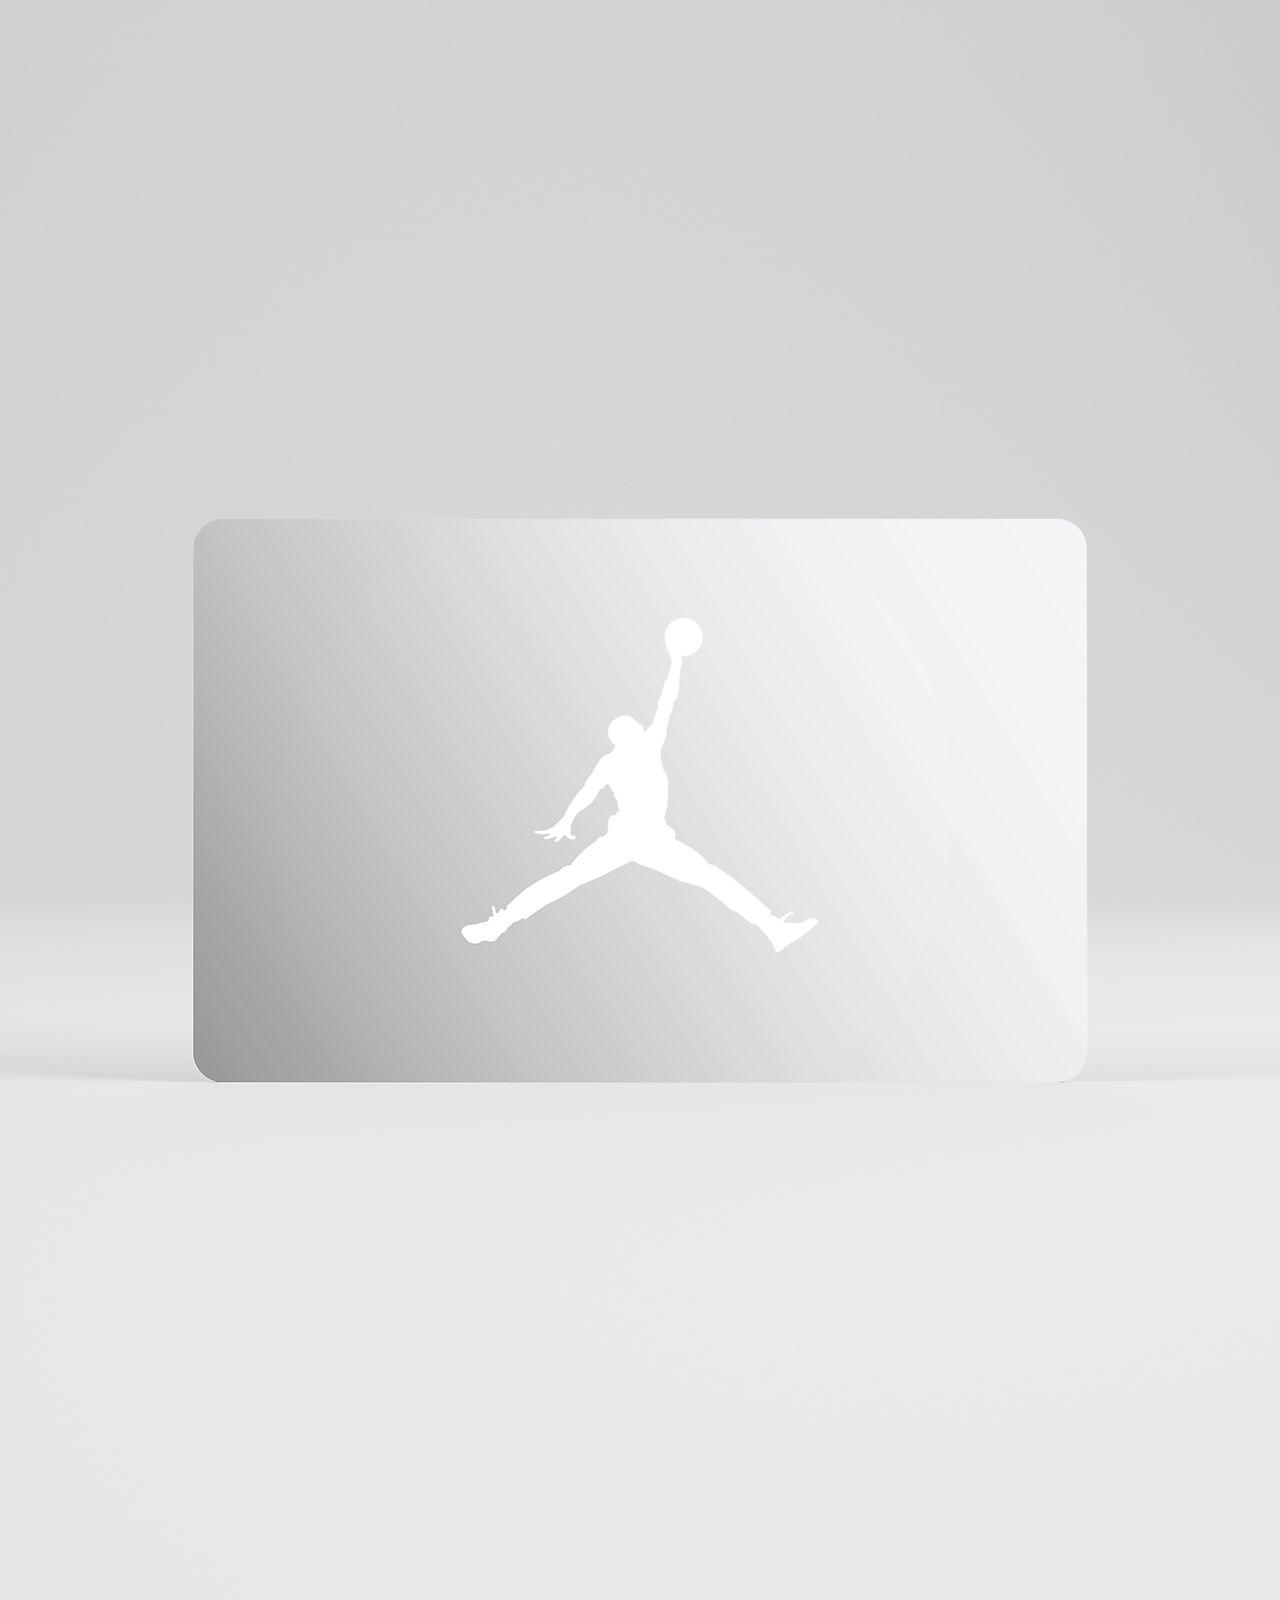 Nike-presentkort